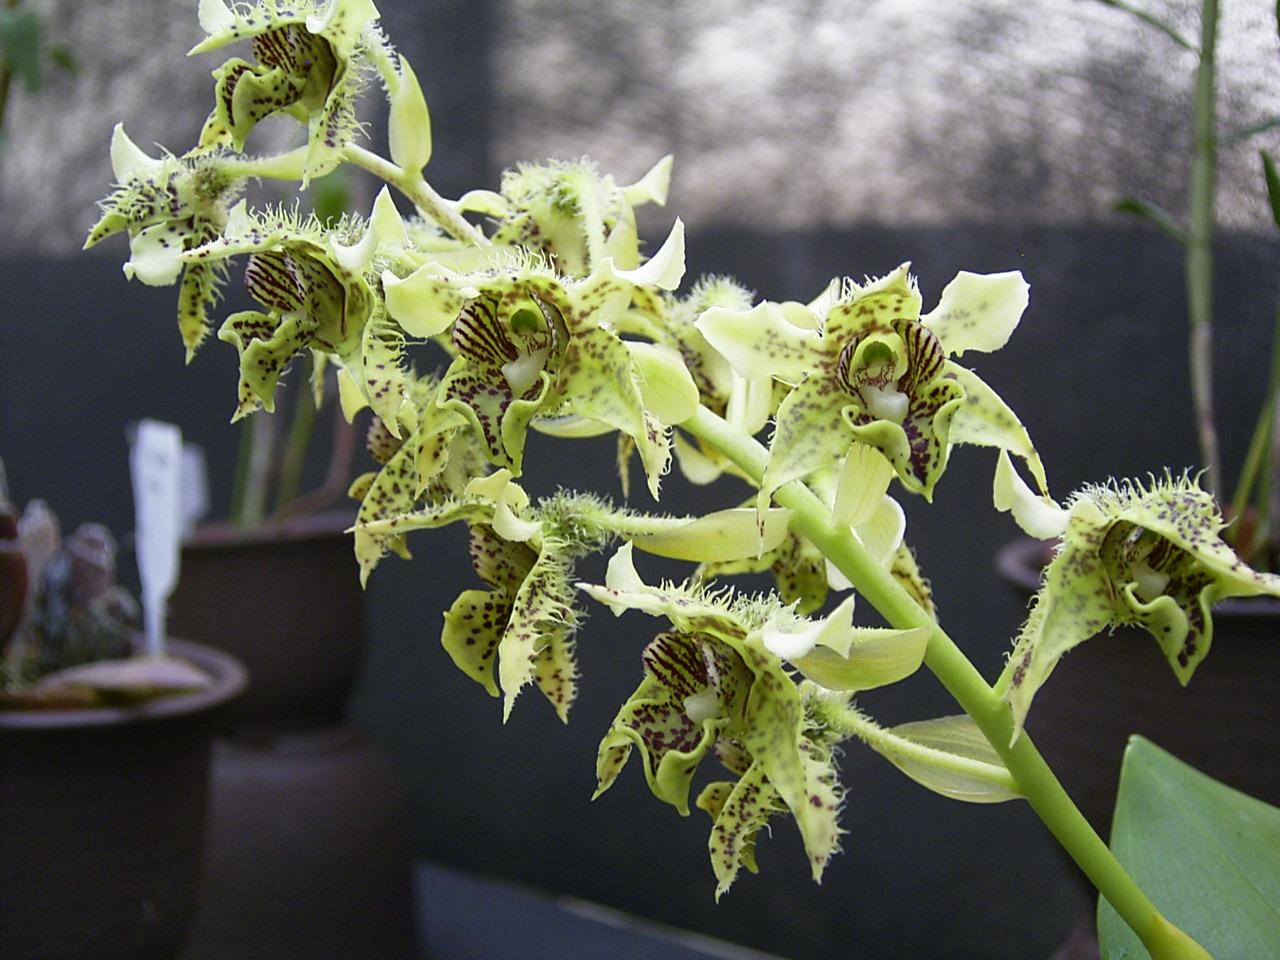 http://orchids.la.coocan.jp/Dendrobium/Dendrobium%20polysema/R0049365.JPG